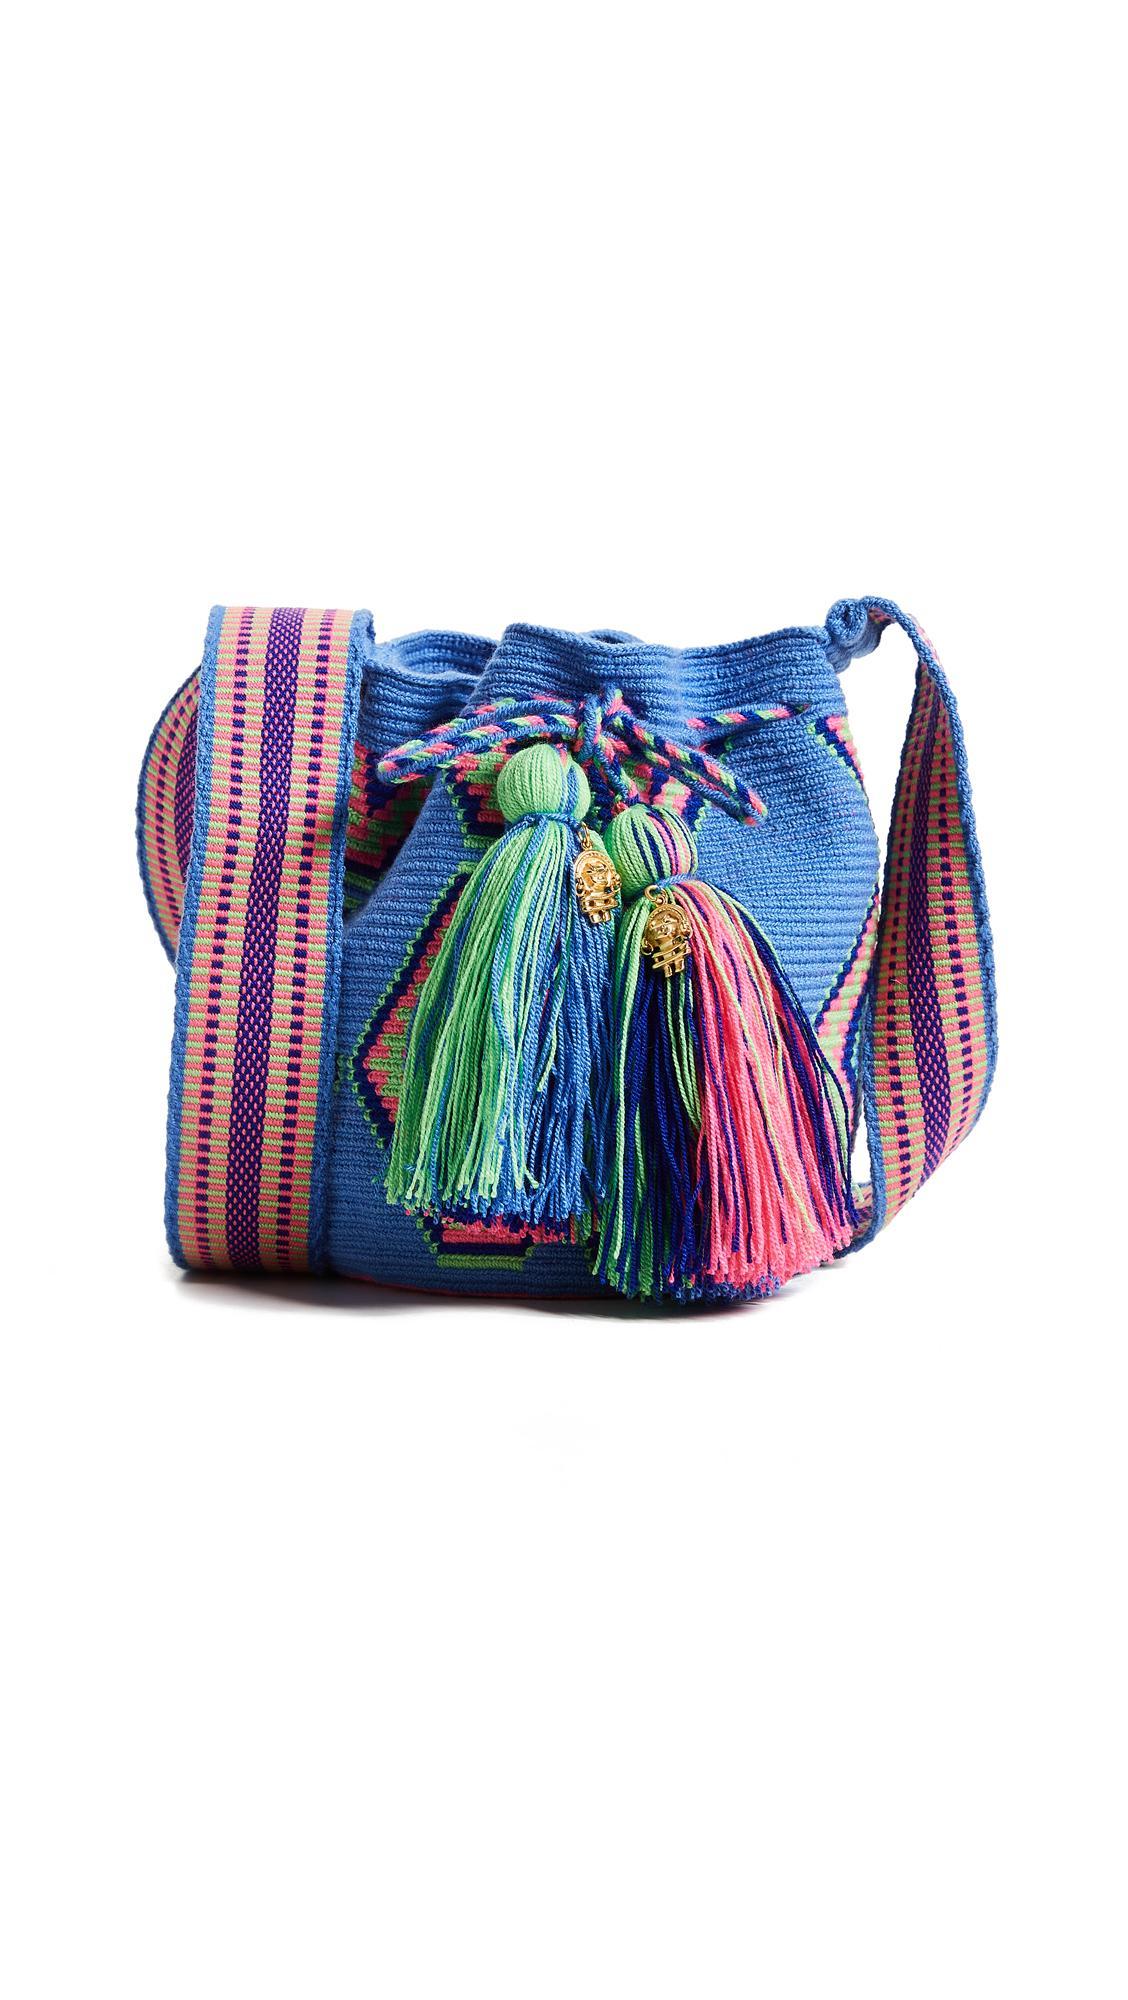 The Way U Mini Mochila Bag In Ulu Blue